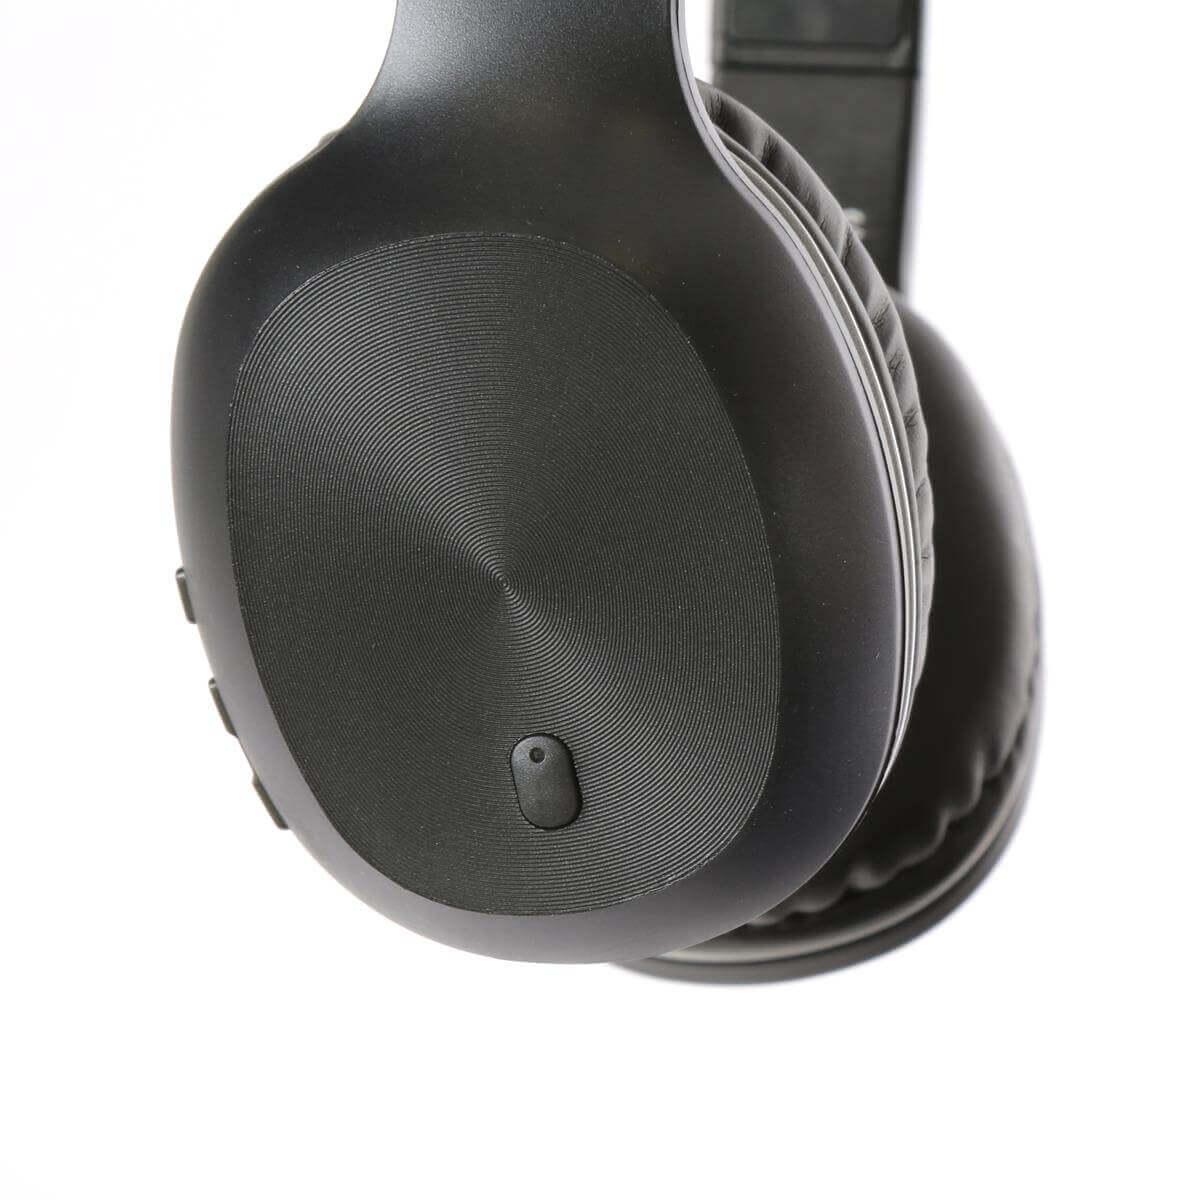 Platinet Freestyle Headset Bluetooth FH0918 — безжични блутут слушалки за мобилни устройства (черен) - 3